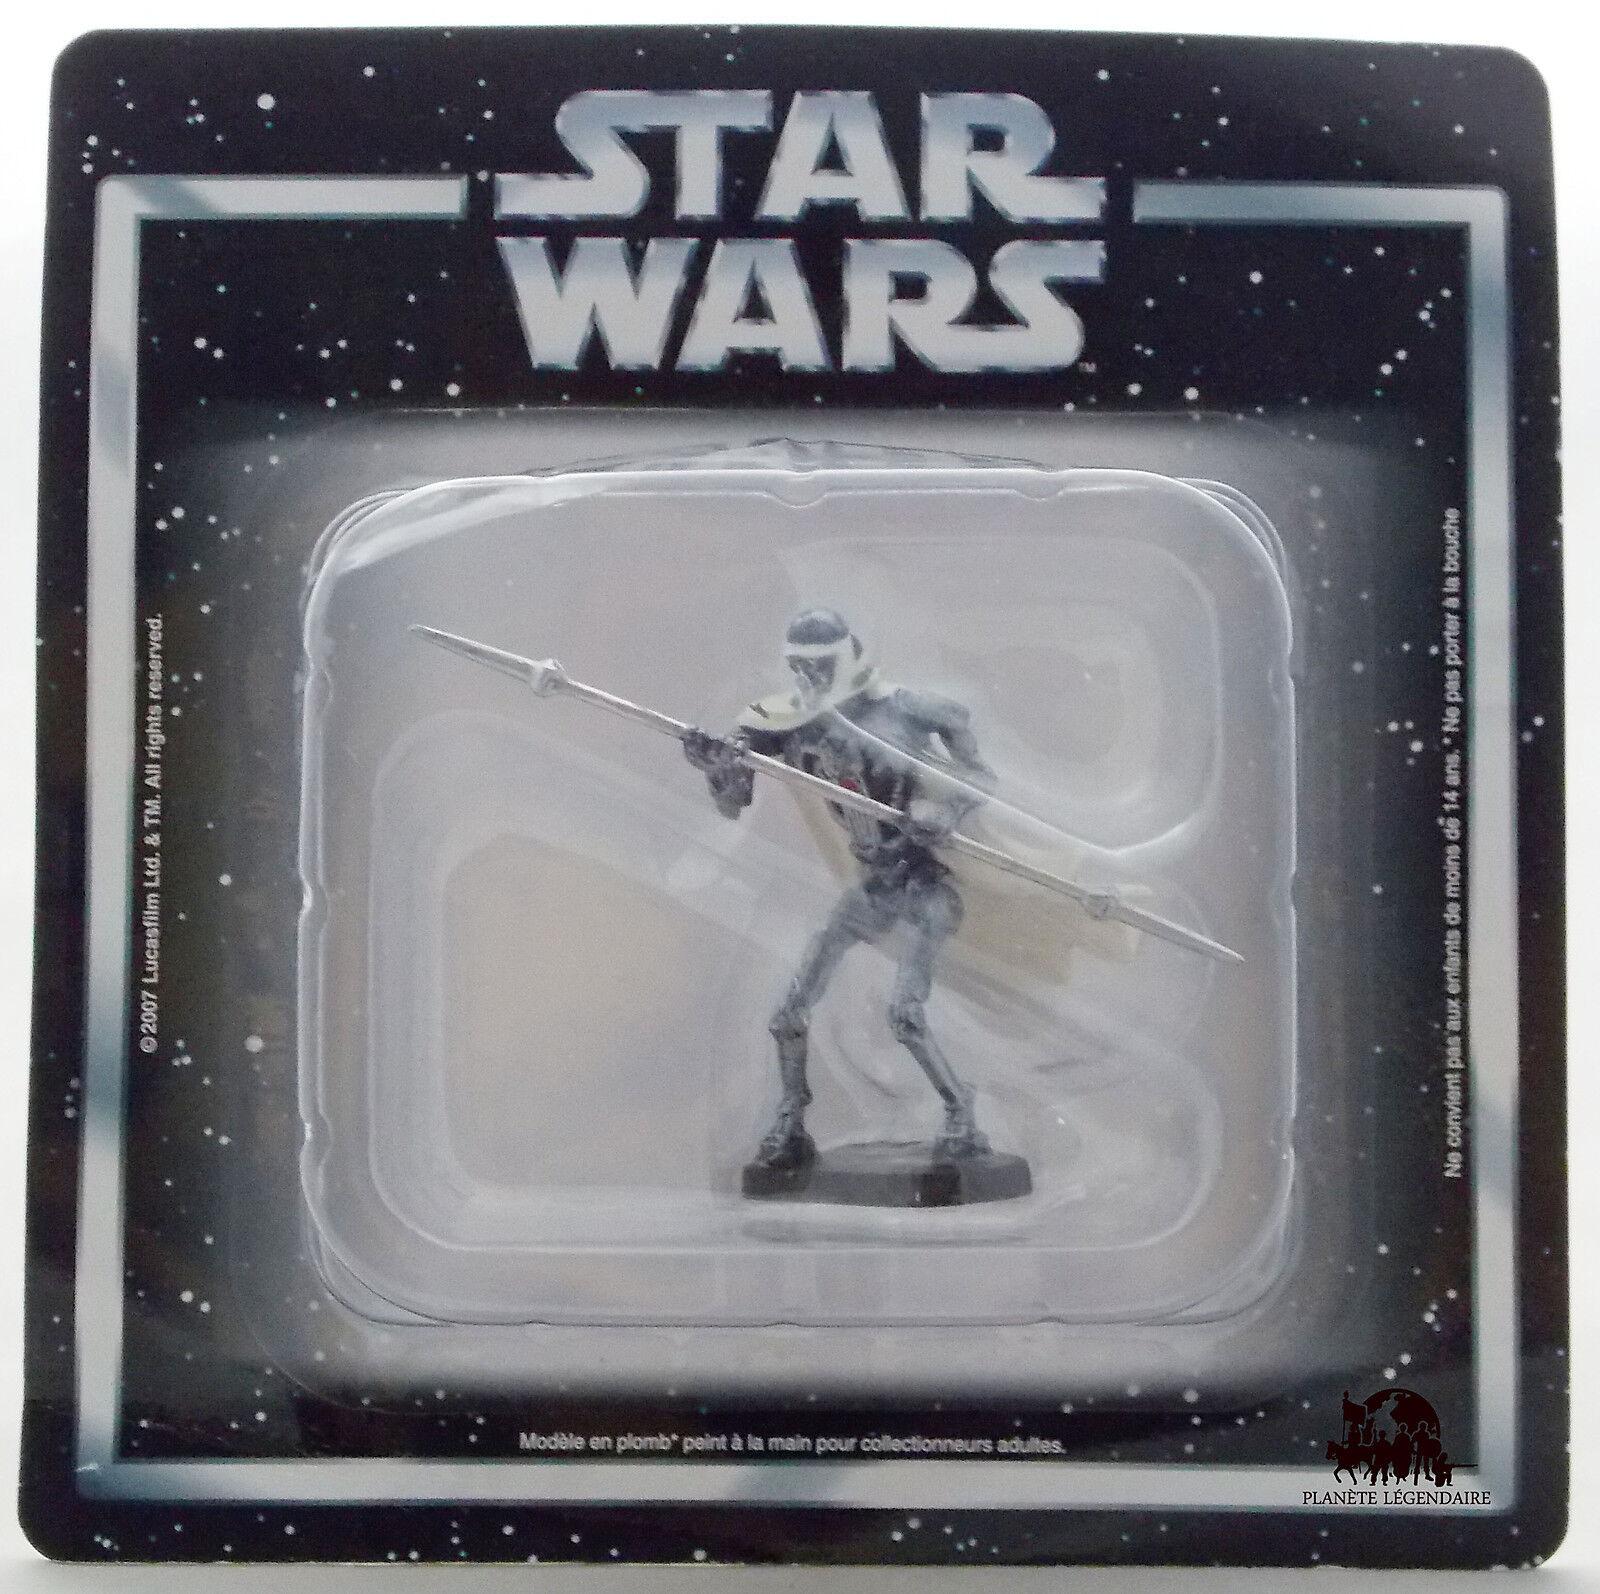 StarWars figurine : Figurine collection Atlas STAR WARS Garde du Corps Général Grievous Figure